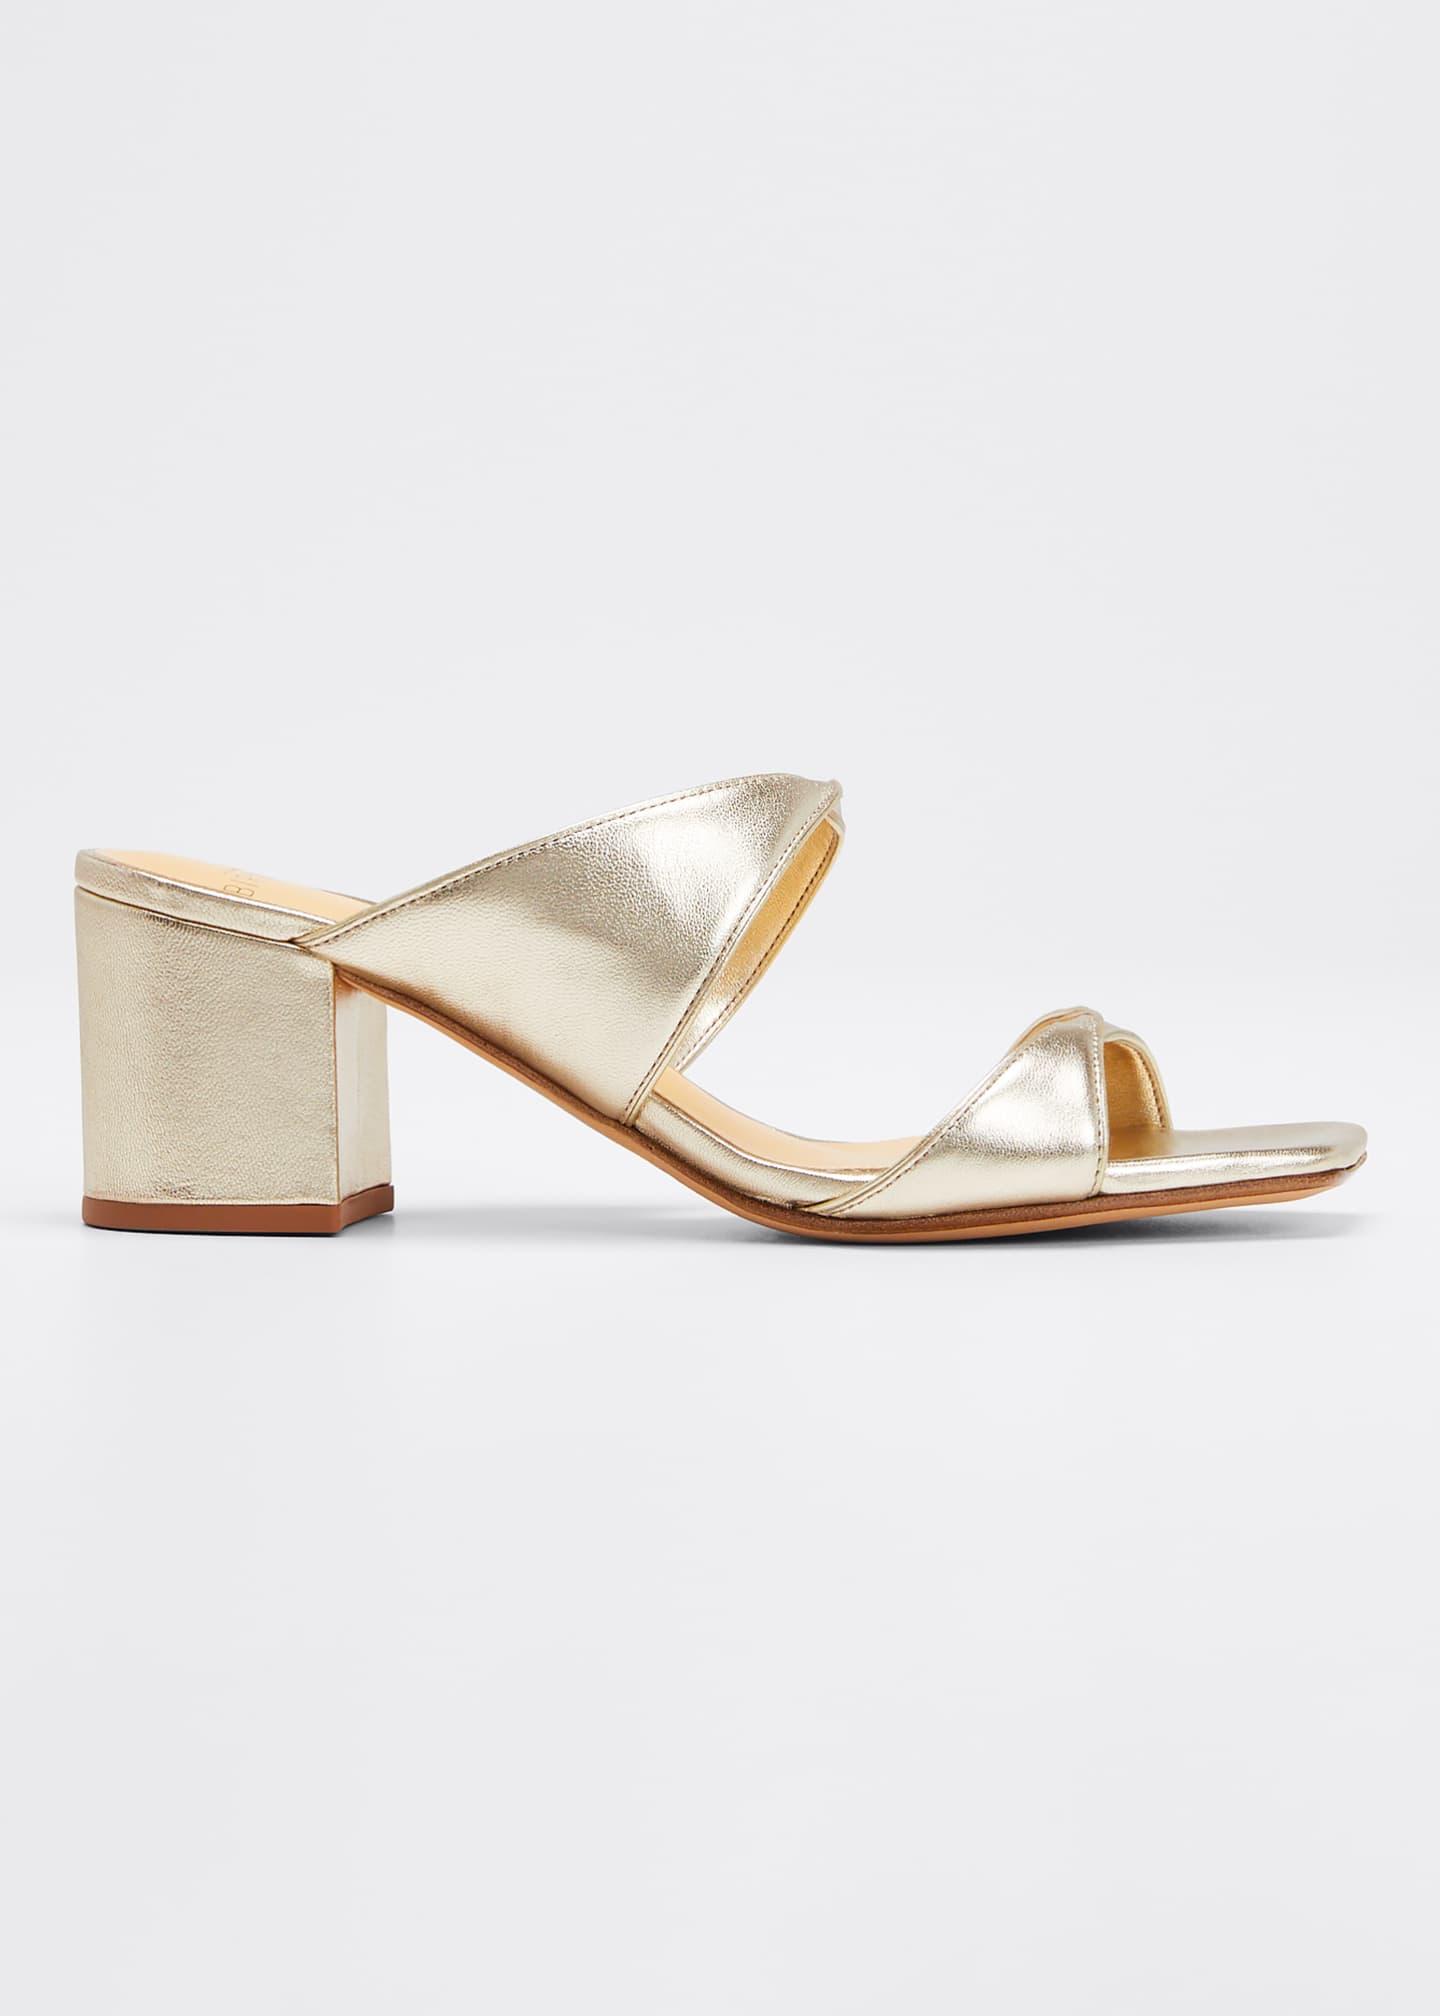 Alexandre Birman Miki Twisted Metallic Leather Slide Sandals